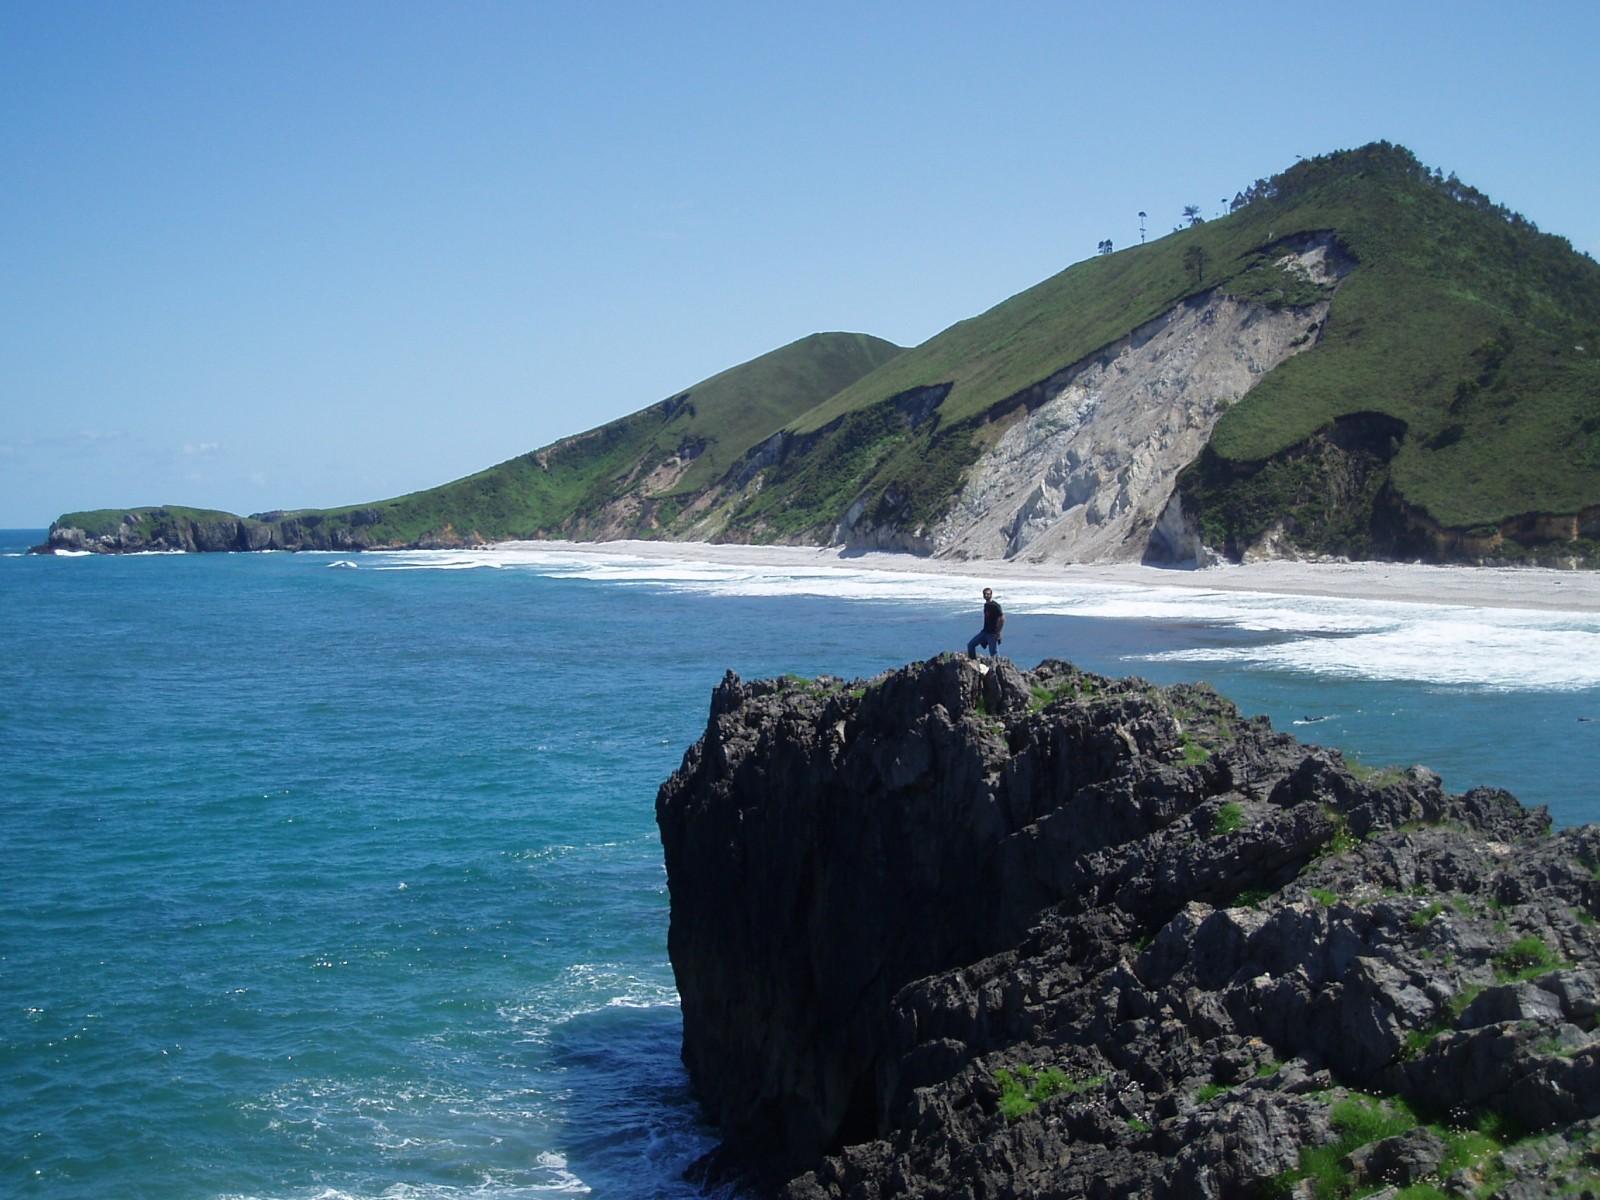 Landslide on the Cantabrian Sea. Credit: Irene Pérez Cáceres (distributed via imaggeo.egu.eu)